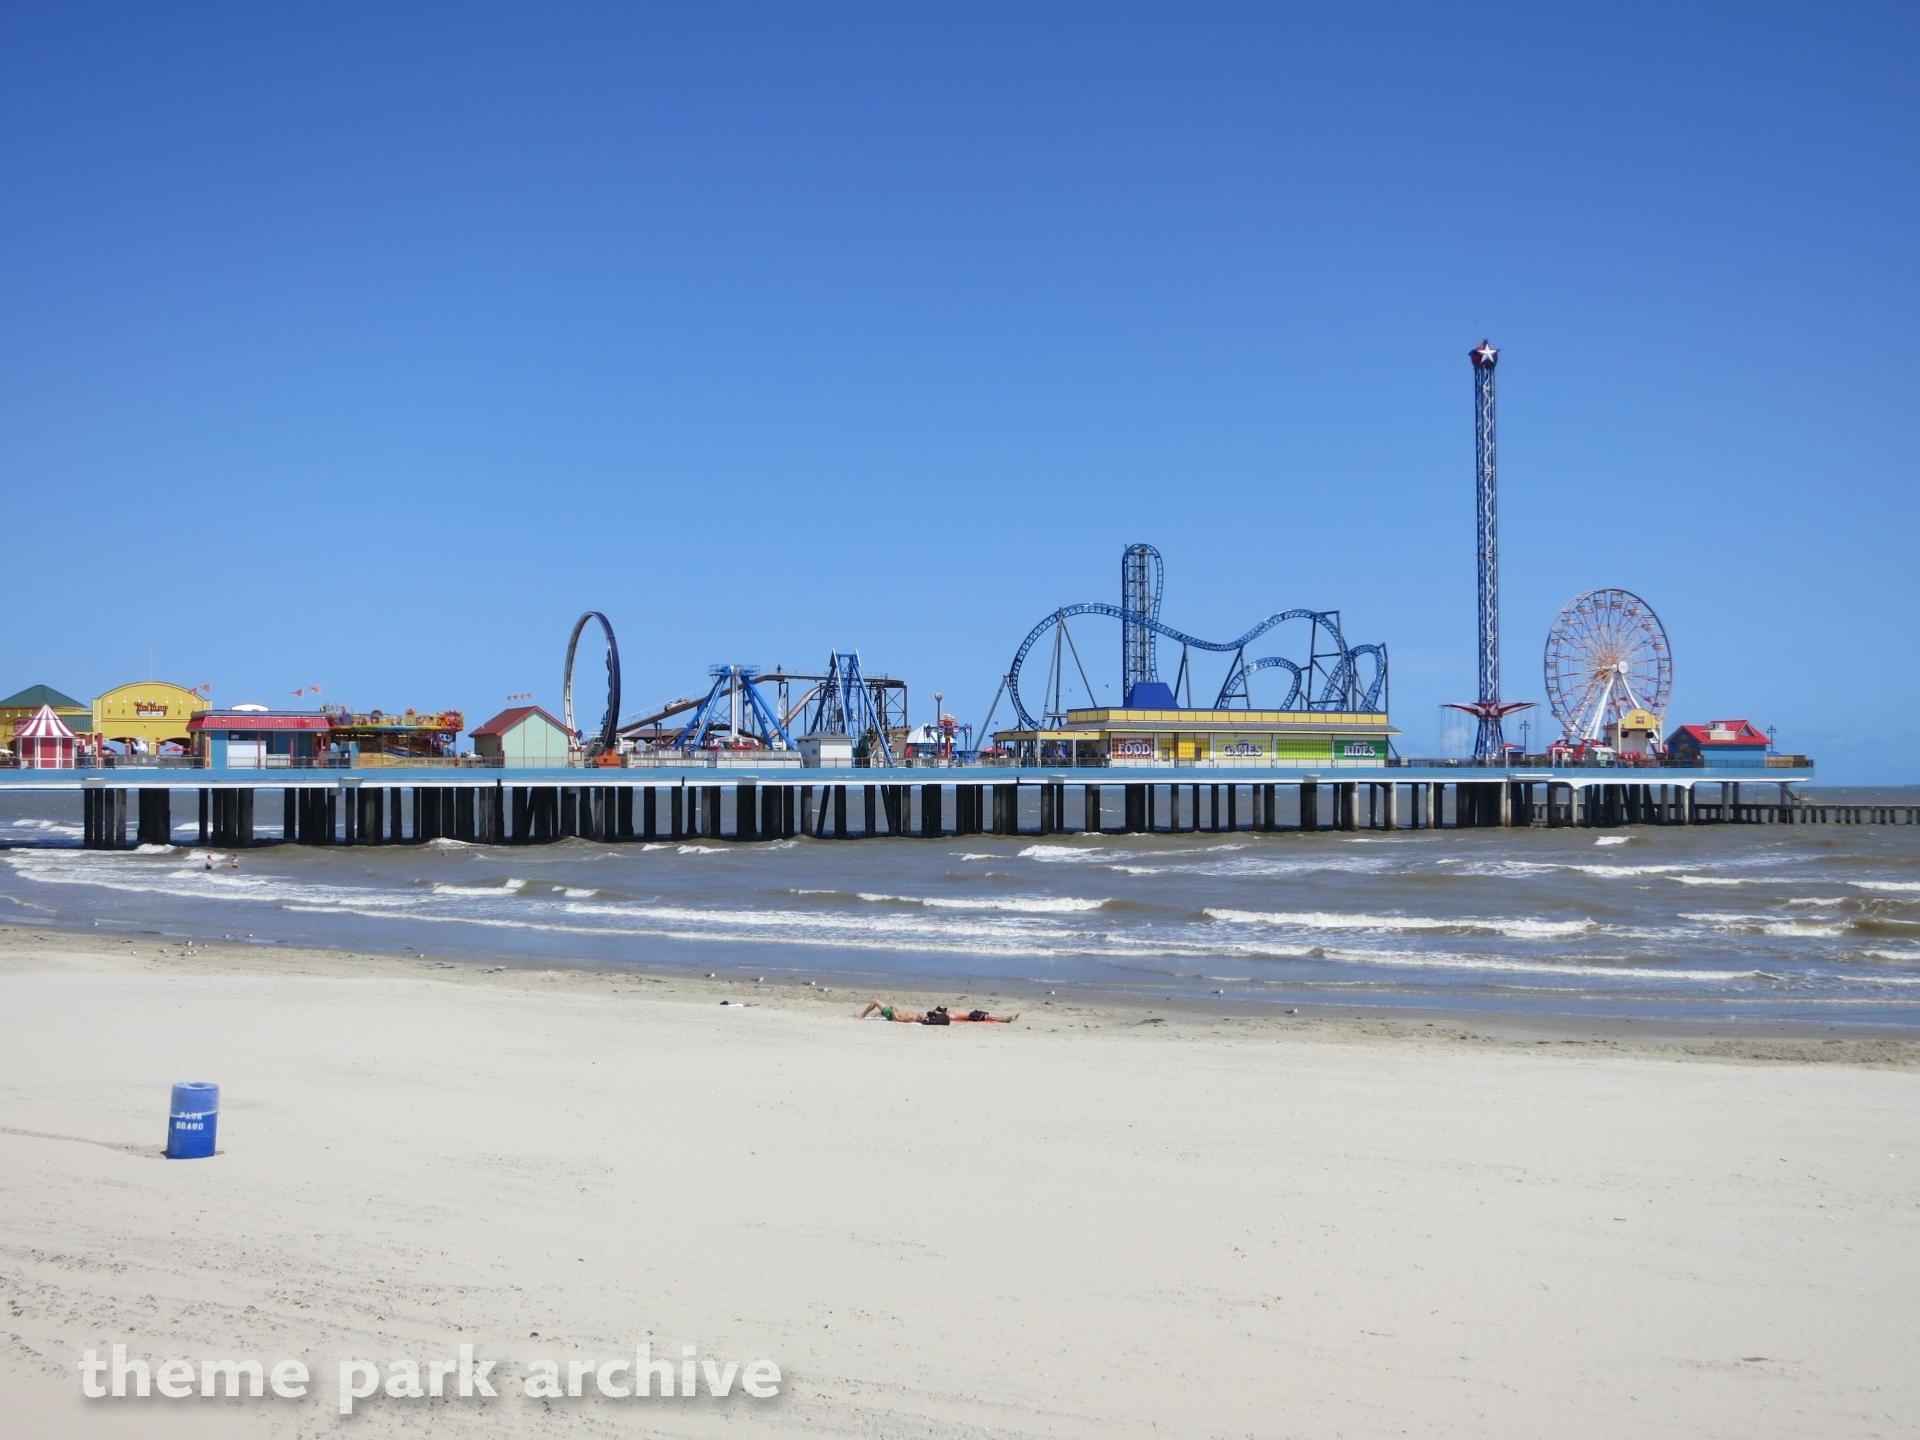 Misc at Galveston Island Historic Pleasure Pier